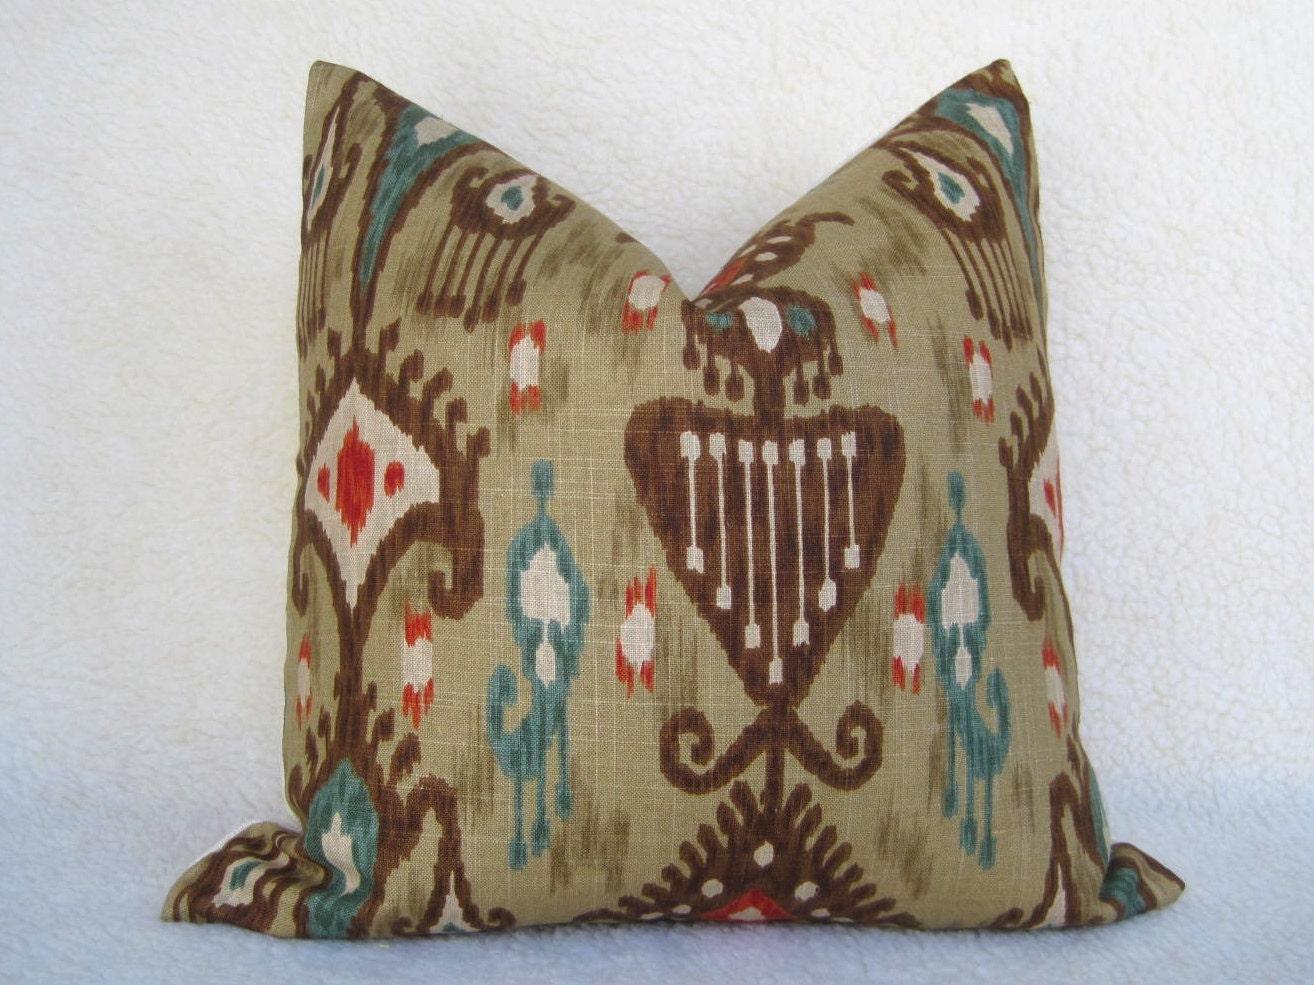 Red Tan And Brown Throw Pillows : Decorative Designer Pillow 18x18 Brown Red Teal Tan